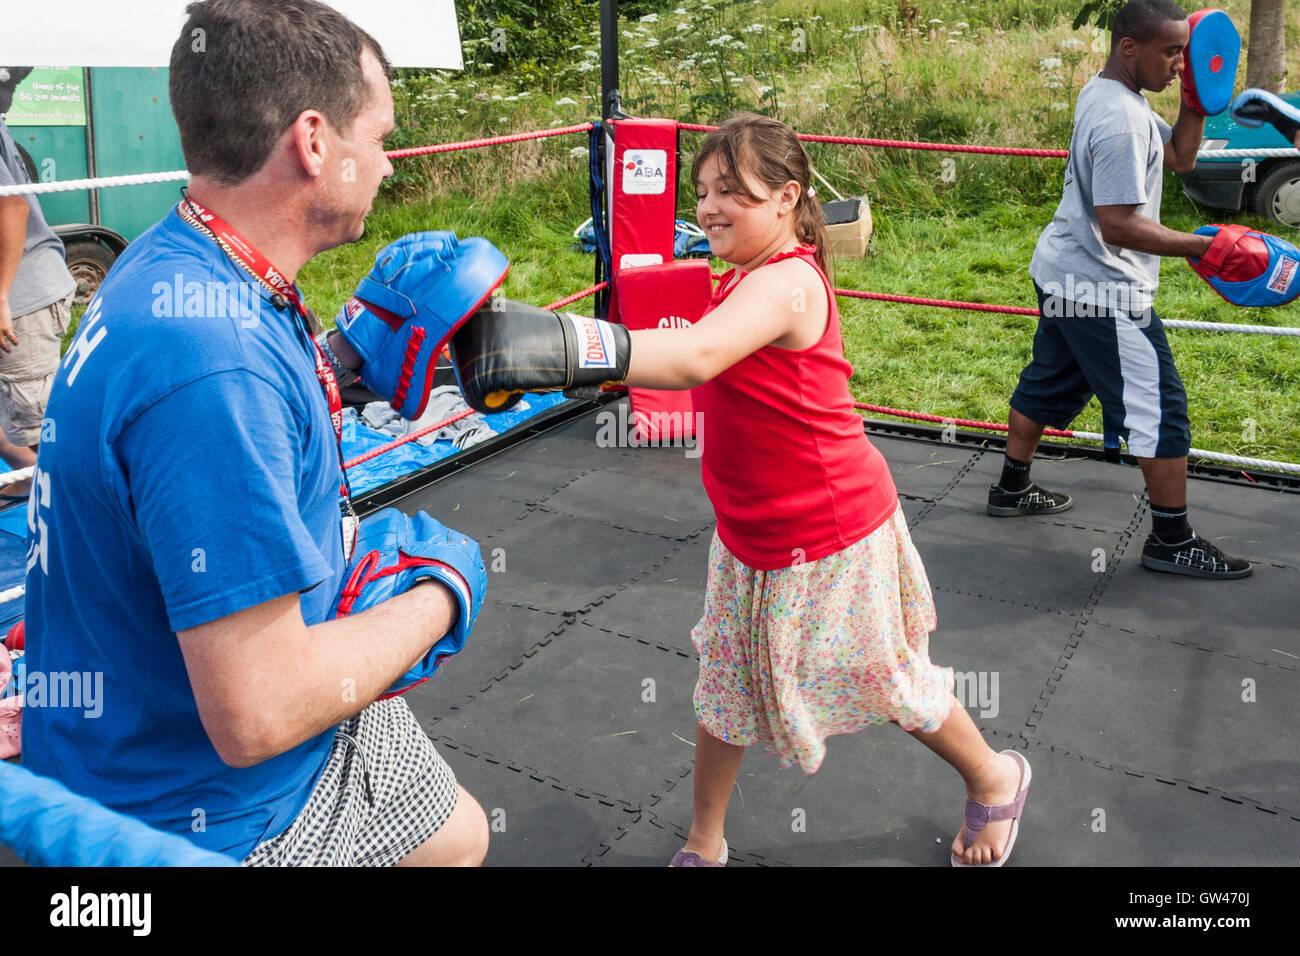 Boxing trainer teaching children to box - Stock Image